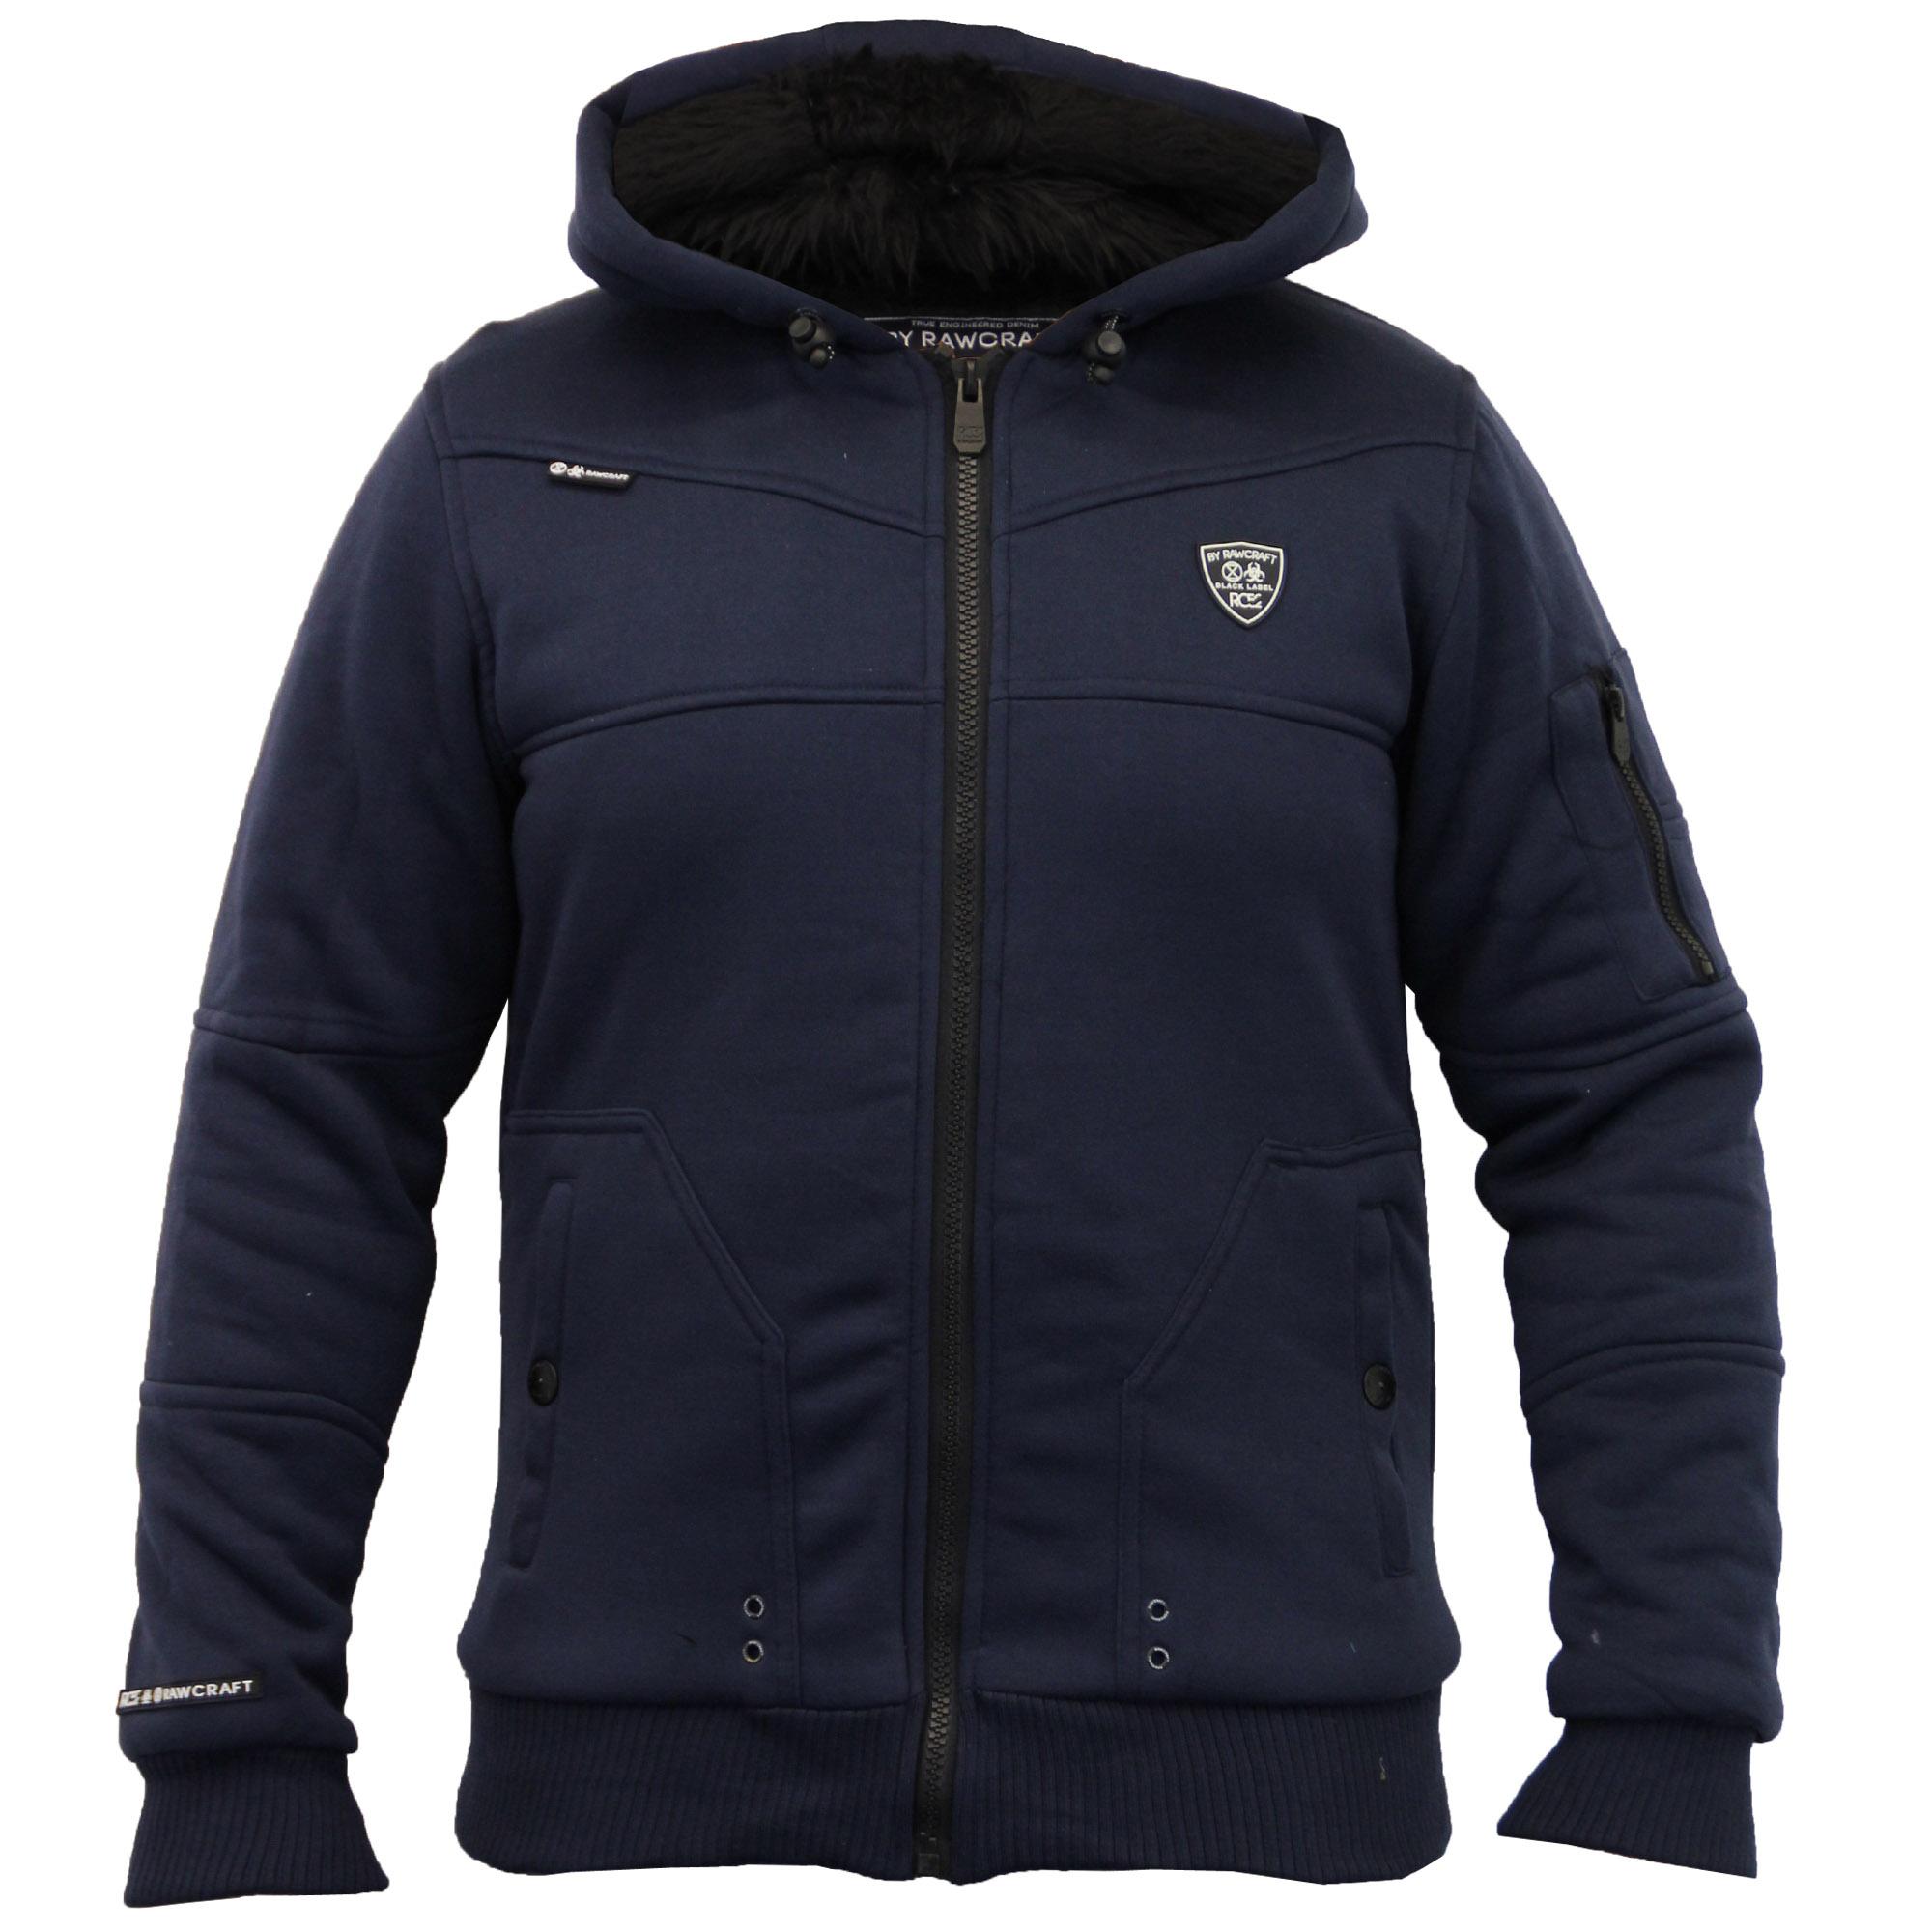 Mens Jacket Rawcraft Sweat Coat Hooded Top Zip Fur Lined ...